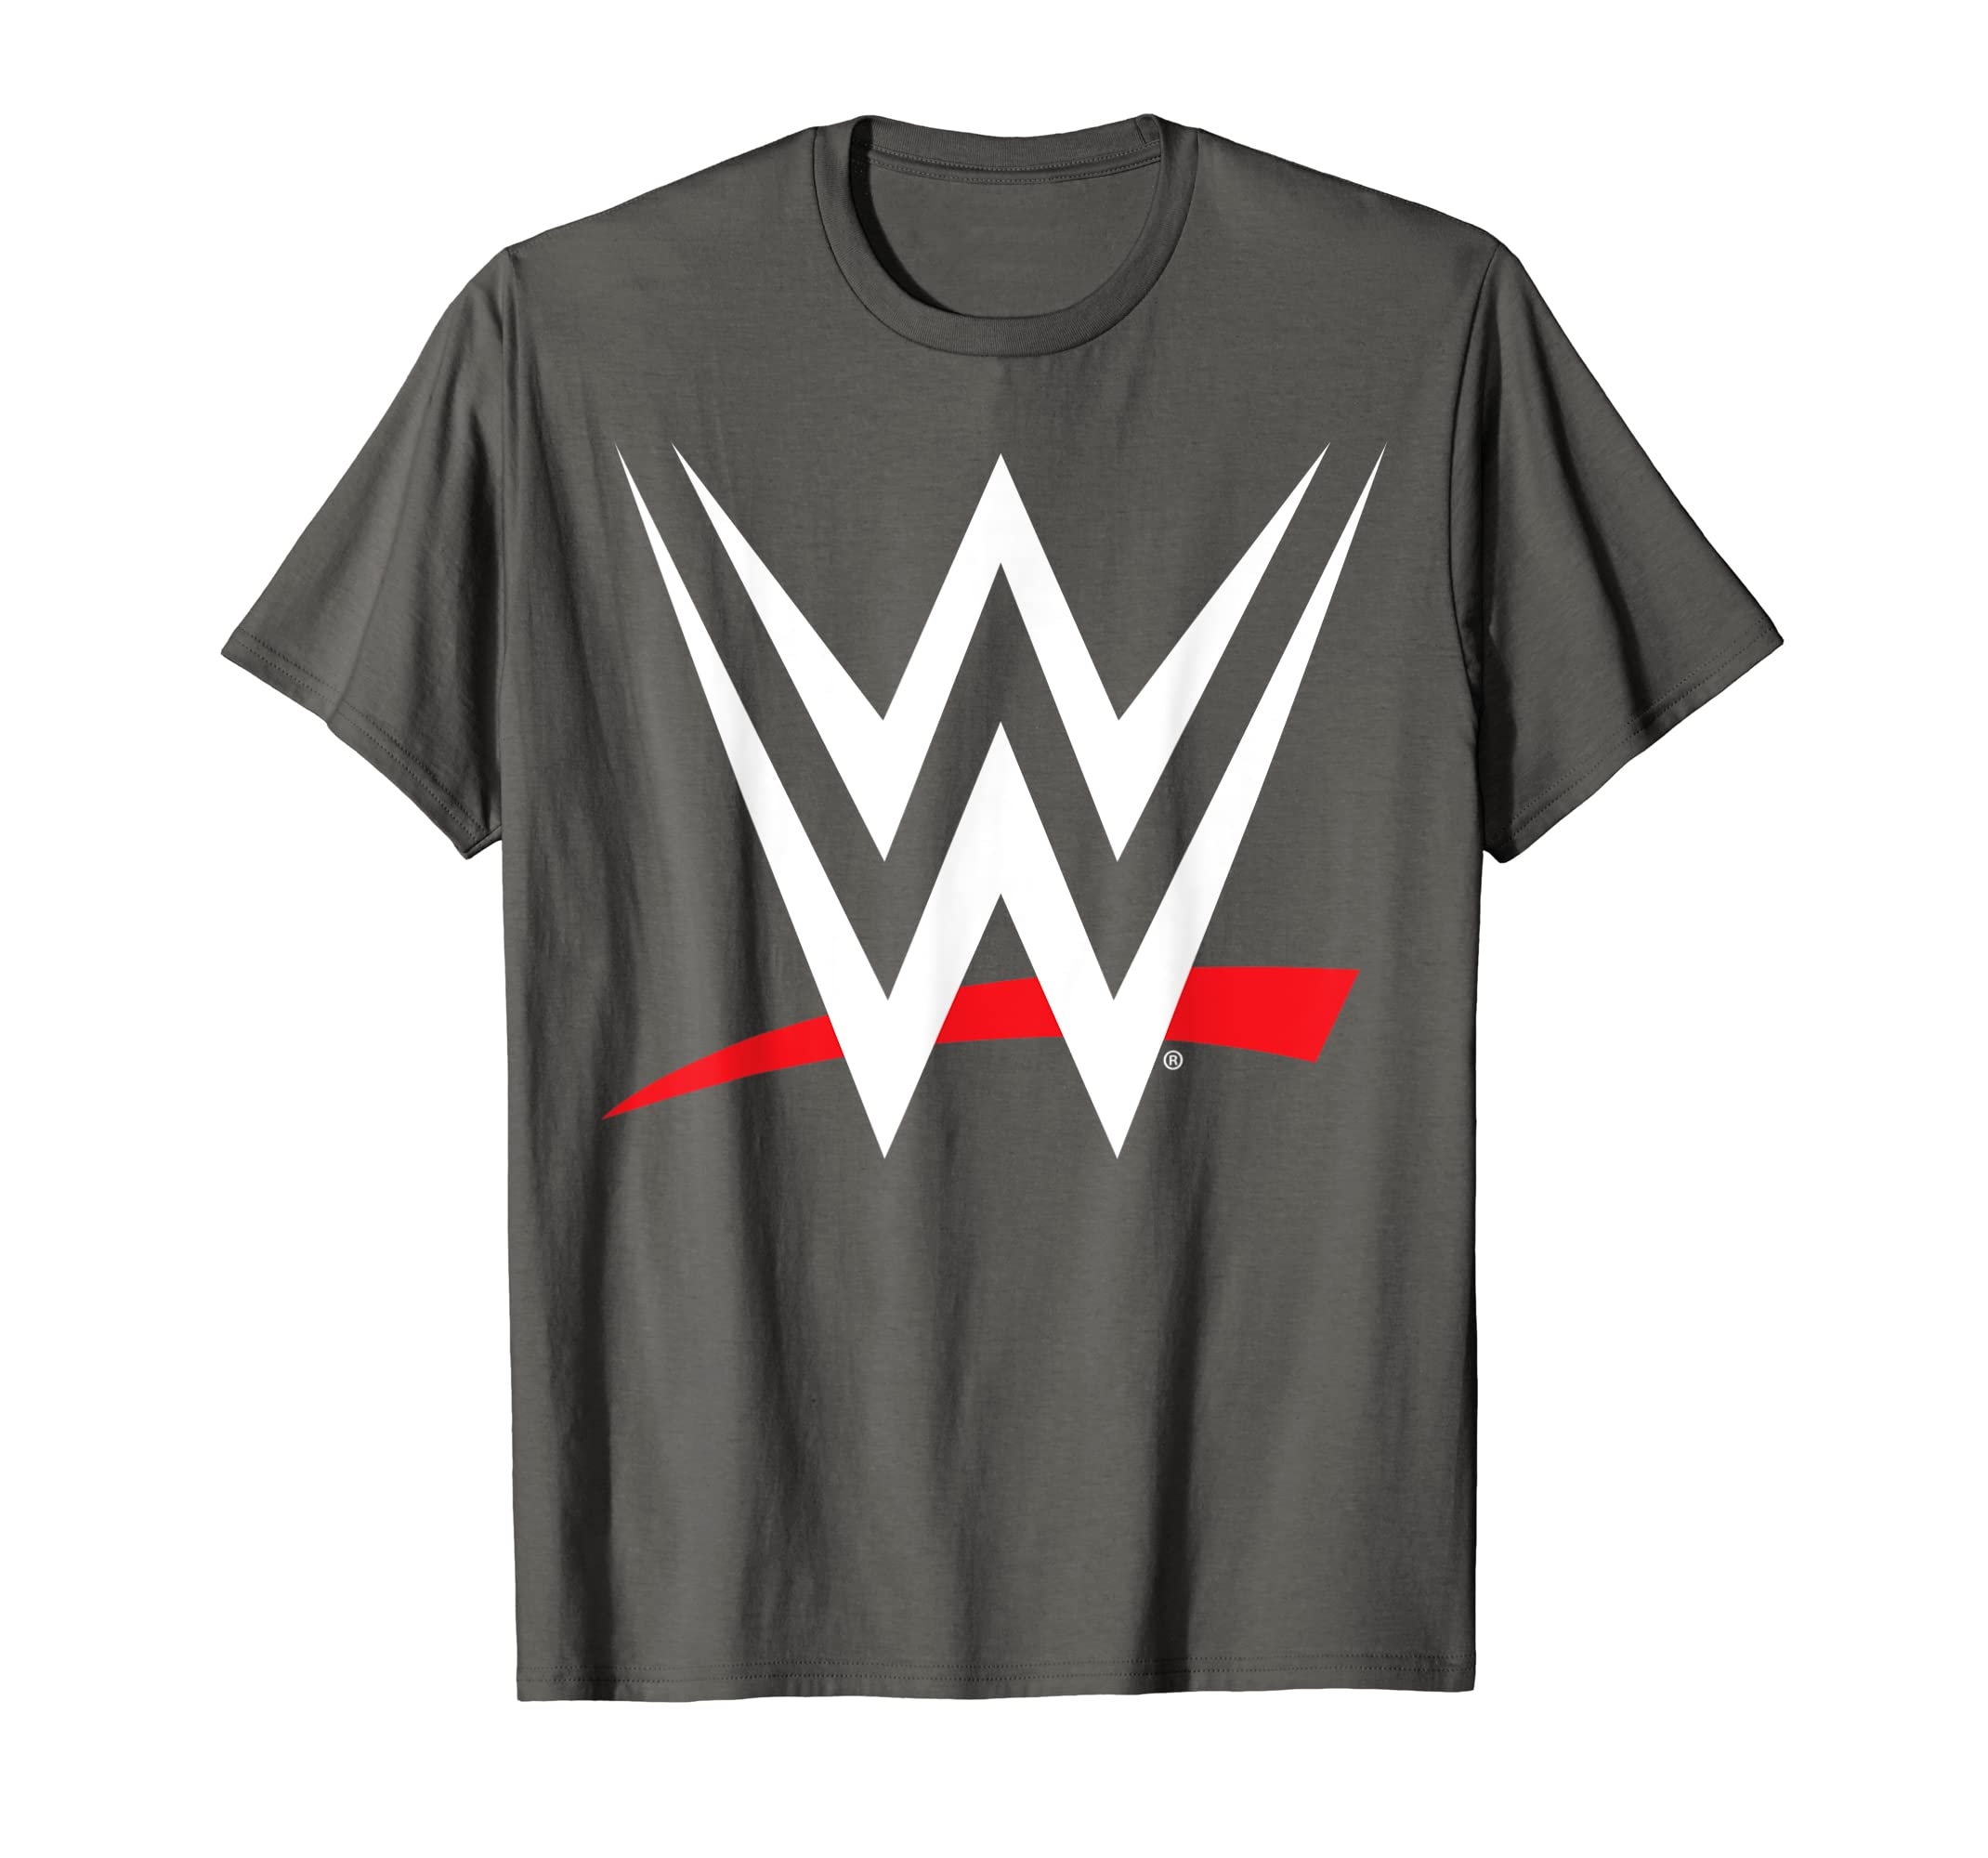 85a75fe041fc Amazon.com  WWE Logo Graphic T-Shirt  Clothing